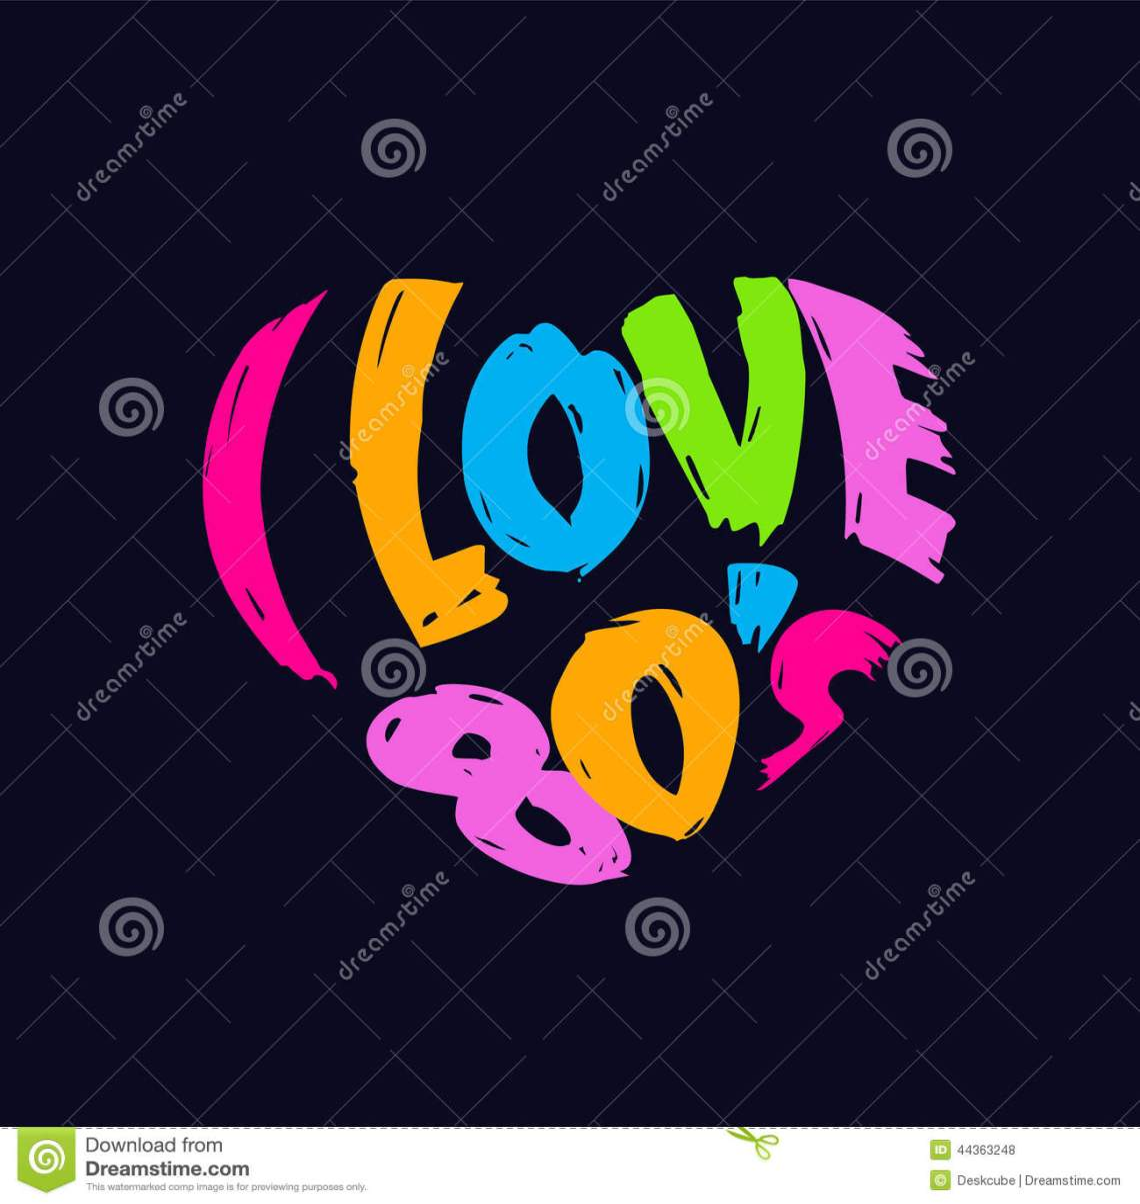 Download I Love 80s Heart Retro Logo Stock Vector - Illustration ...